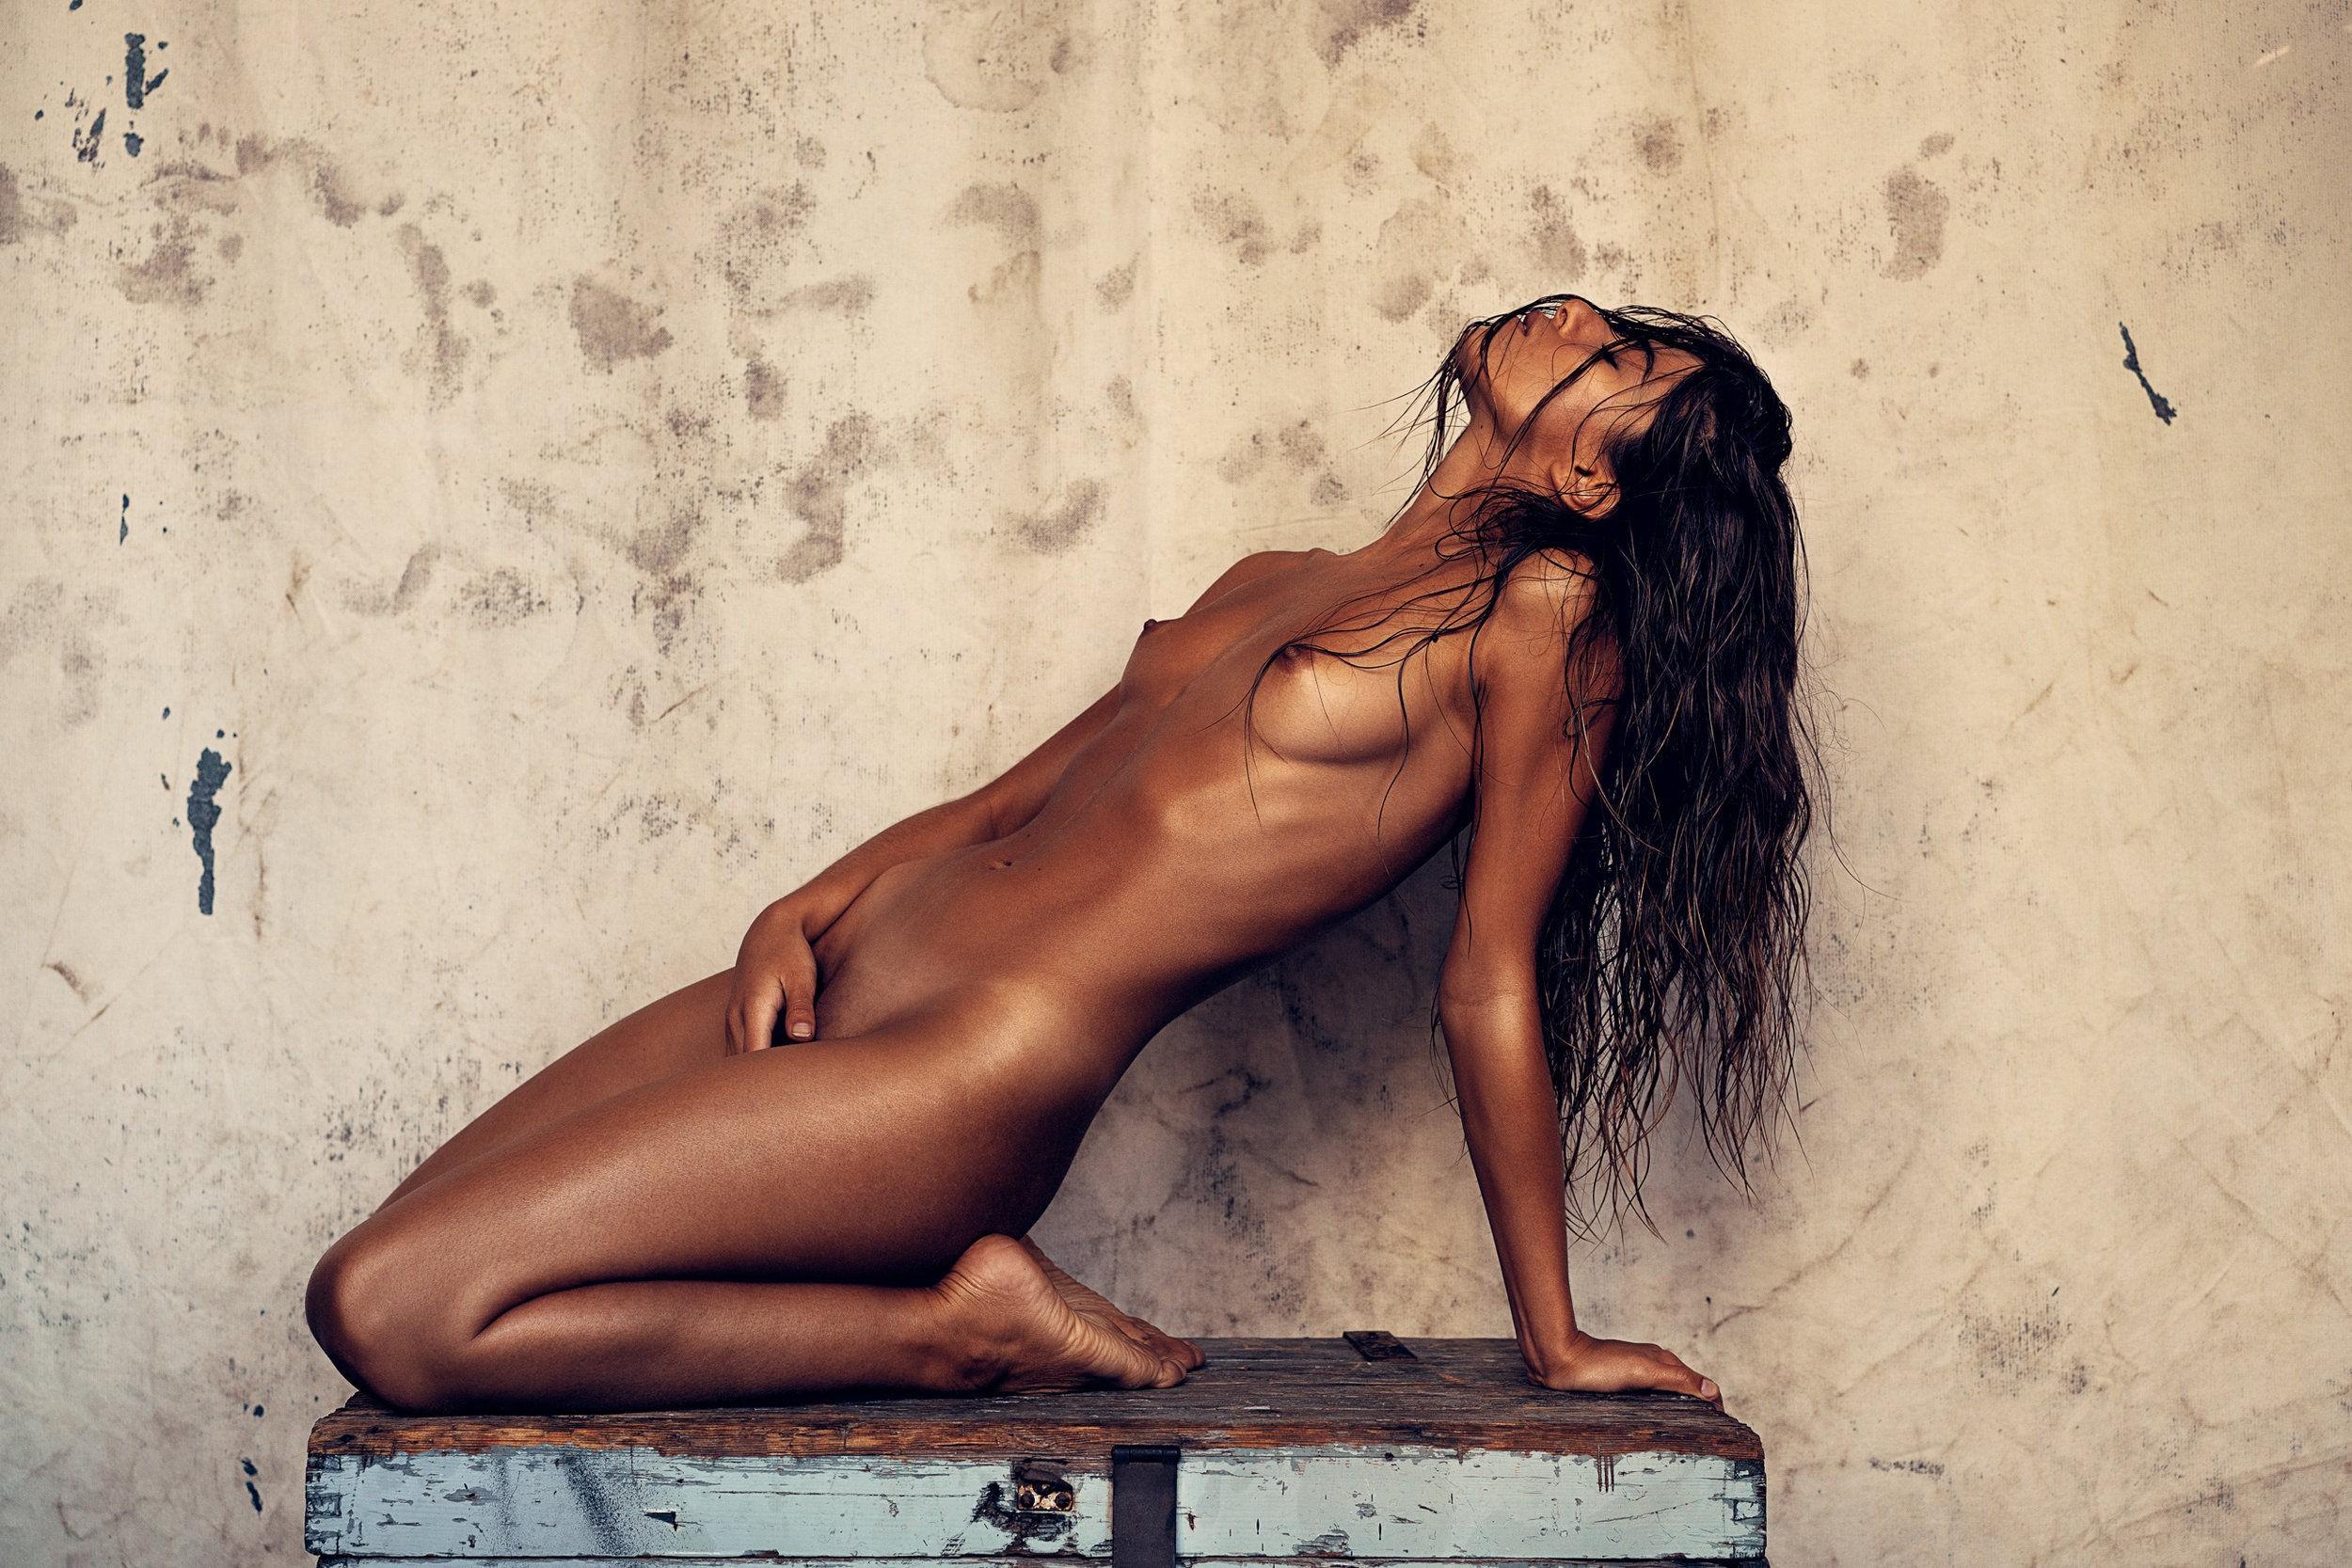 Kristin chenoweth nude pics, page